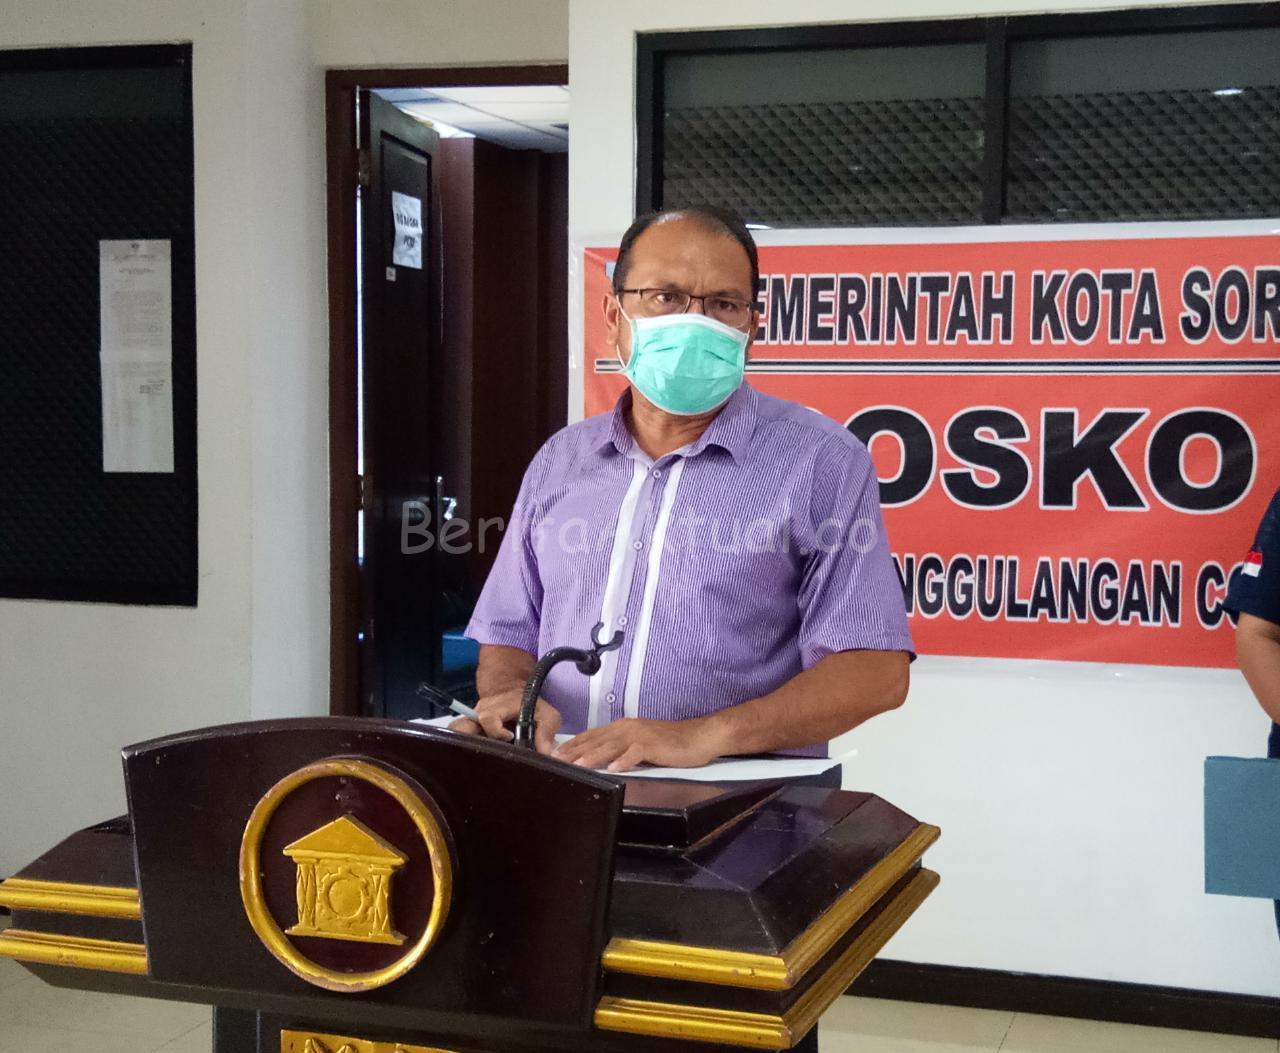 Pemkot Sorong Siapkan Lahan Pemakaman Jenazah Covid-19 di Kilometer 12 Masuk 1 IMG 20200404 WA0041